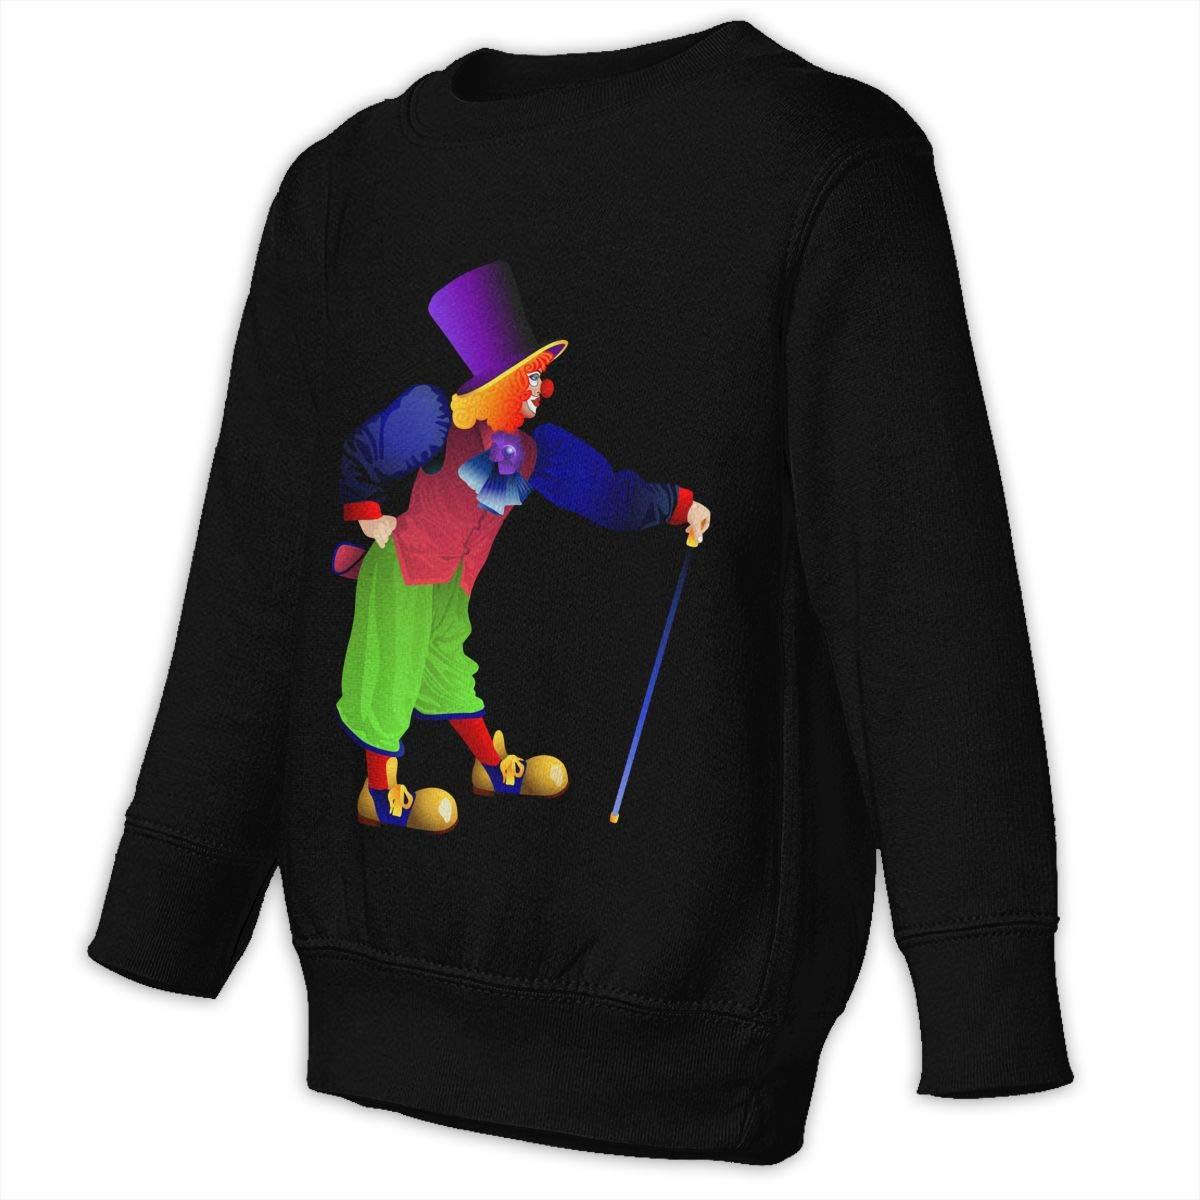 Amazon.com: Toddler Juvenile Sweatshirt Clown Transparent.